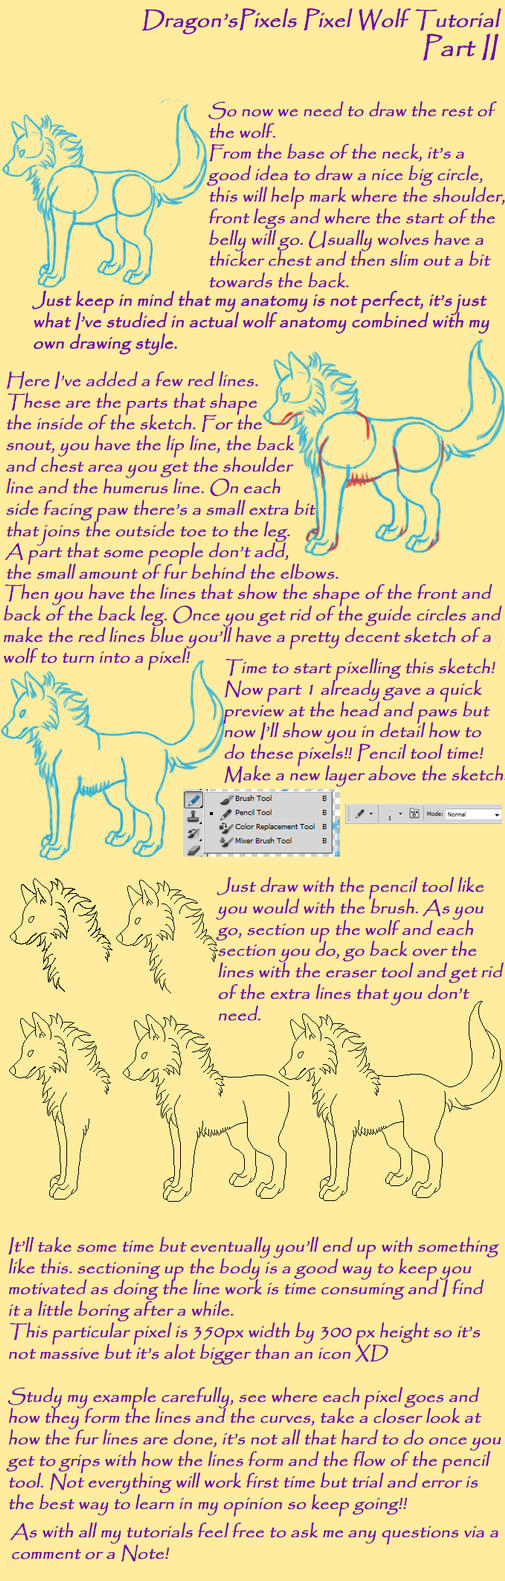 Dragon'spixels Pixel Wolf Tutorial Part 2 By Dragonspixels